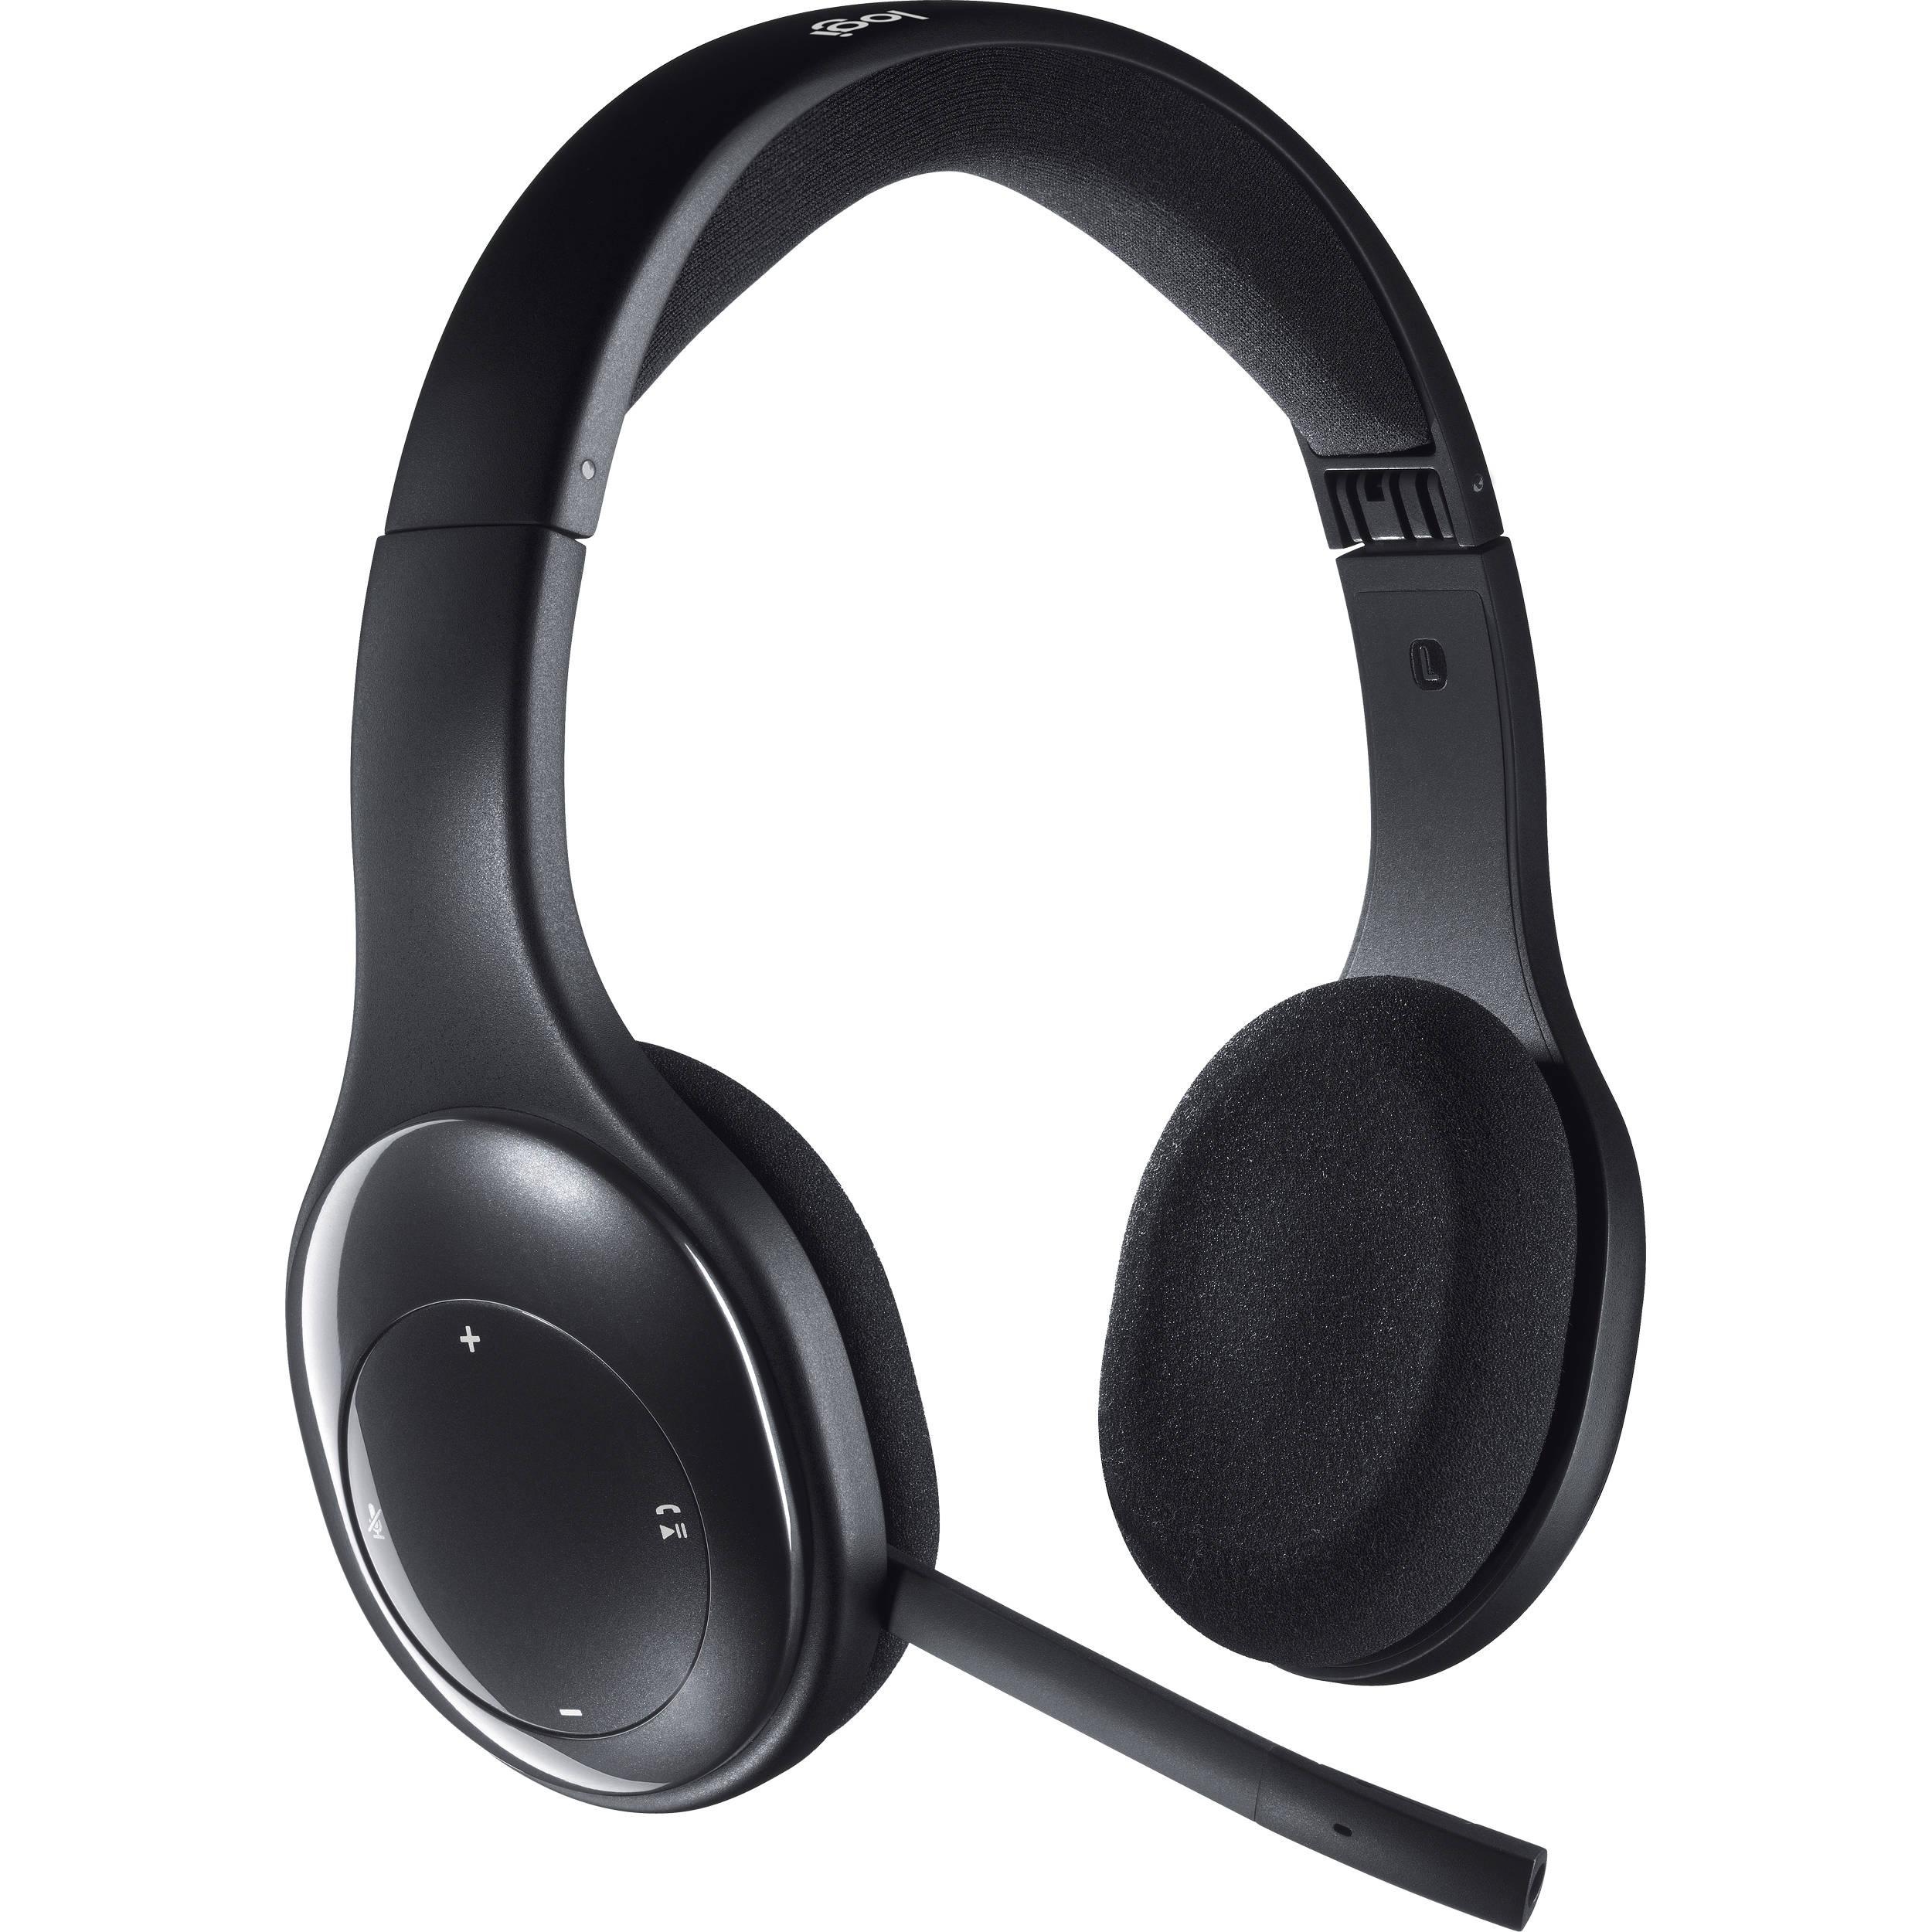 608b718e073 Logitech H800 Wireless Stereo Headset 981-000337 B&H Photo Video